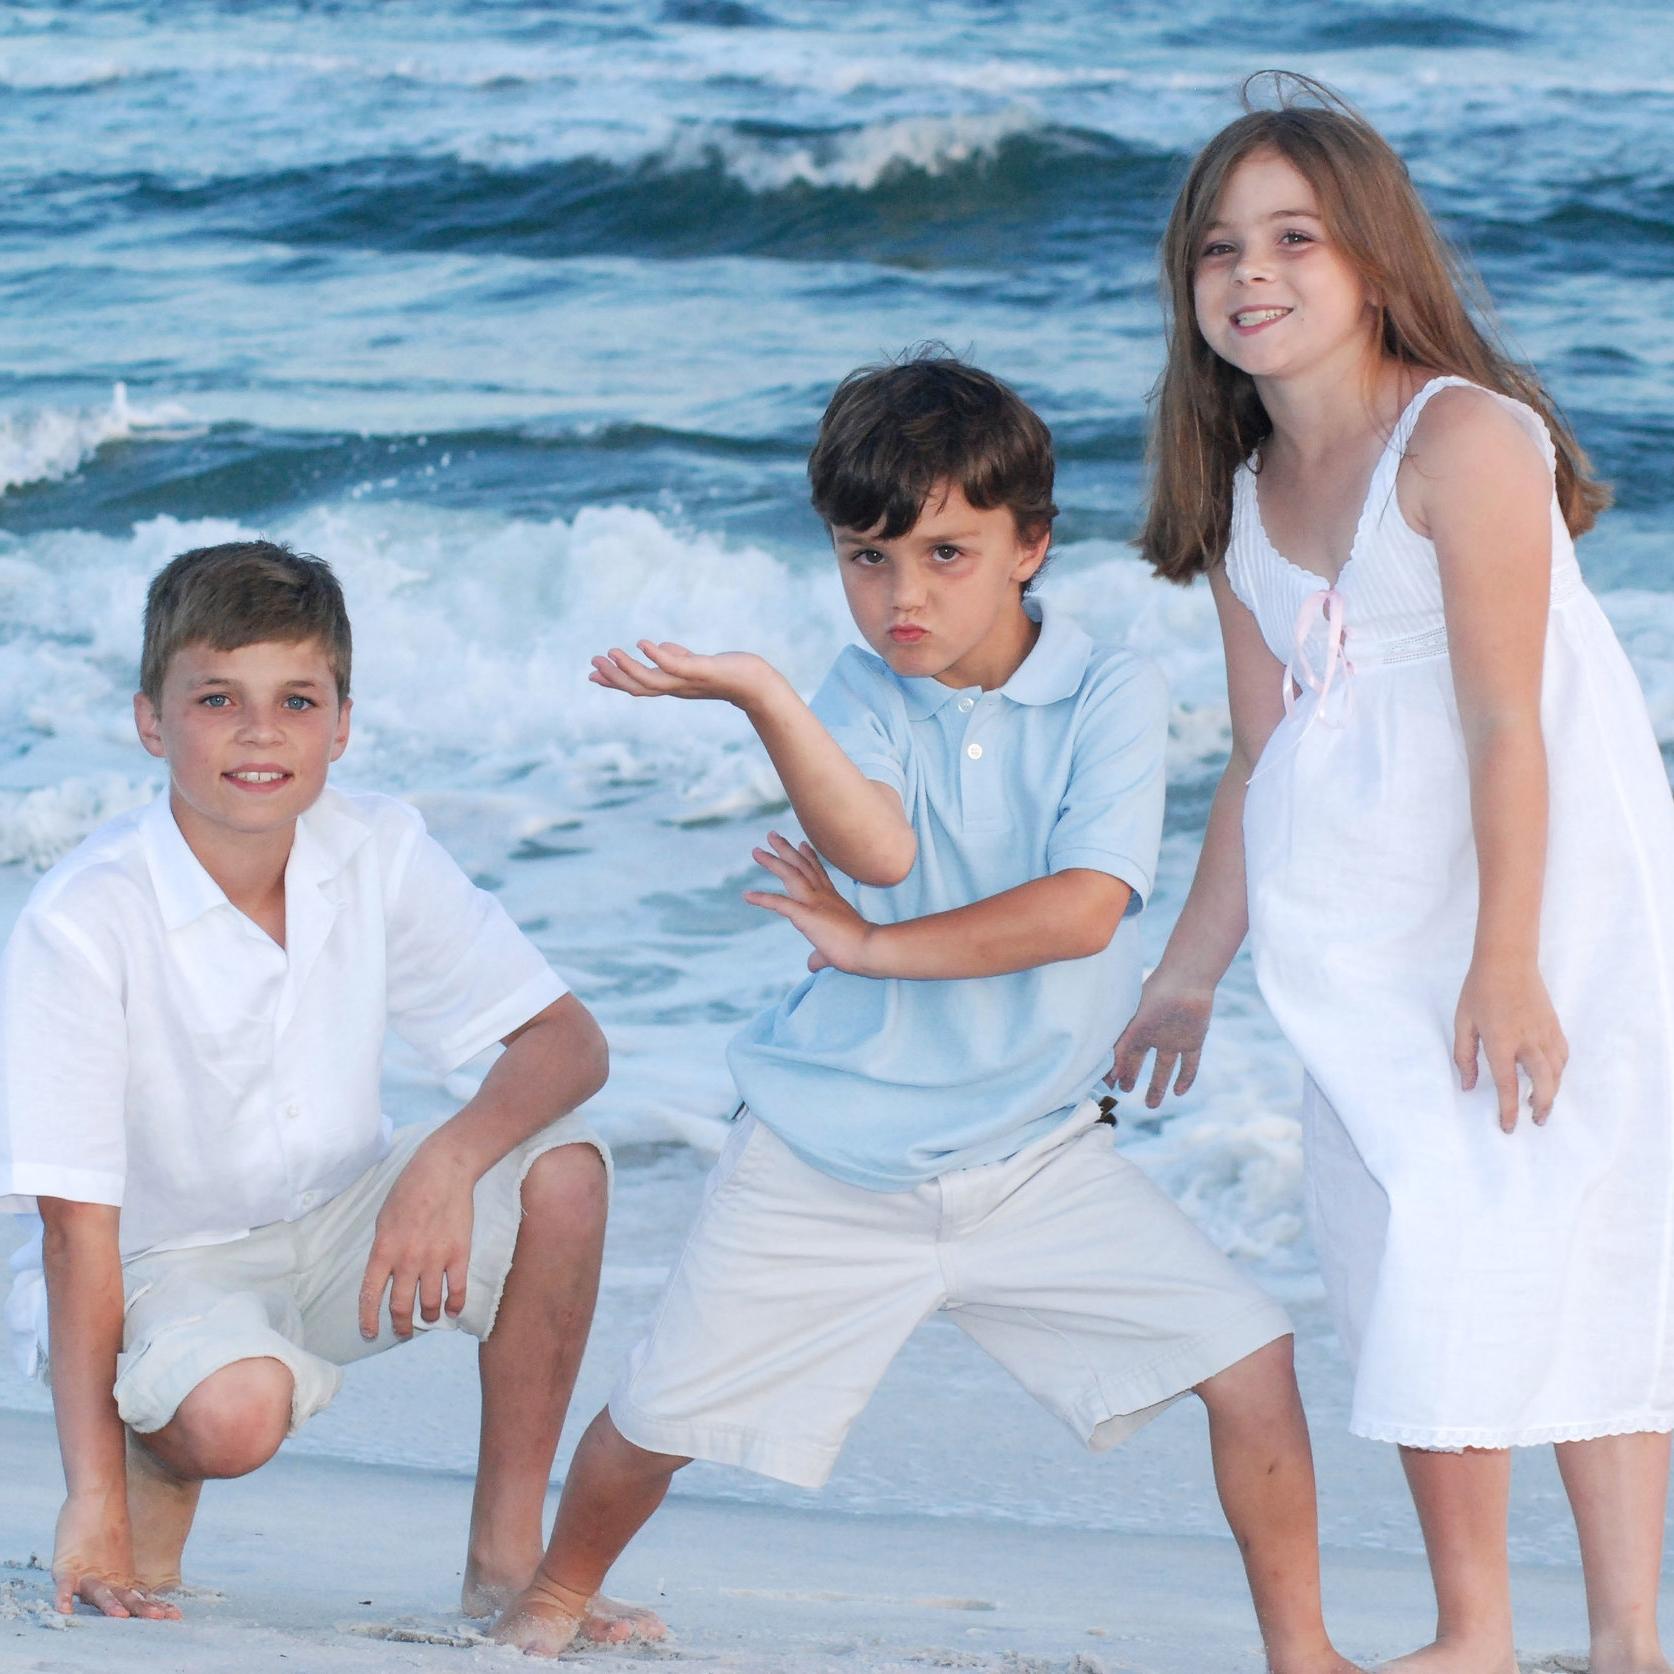 05 28 07 Kesler Beach Portraits 67 Top 100 - web.jpg